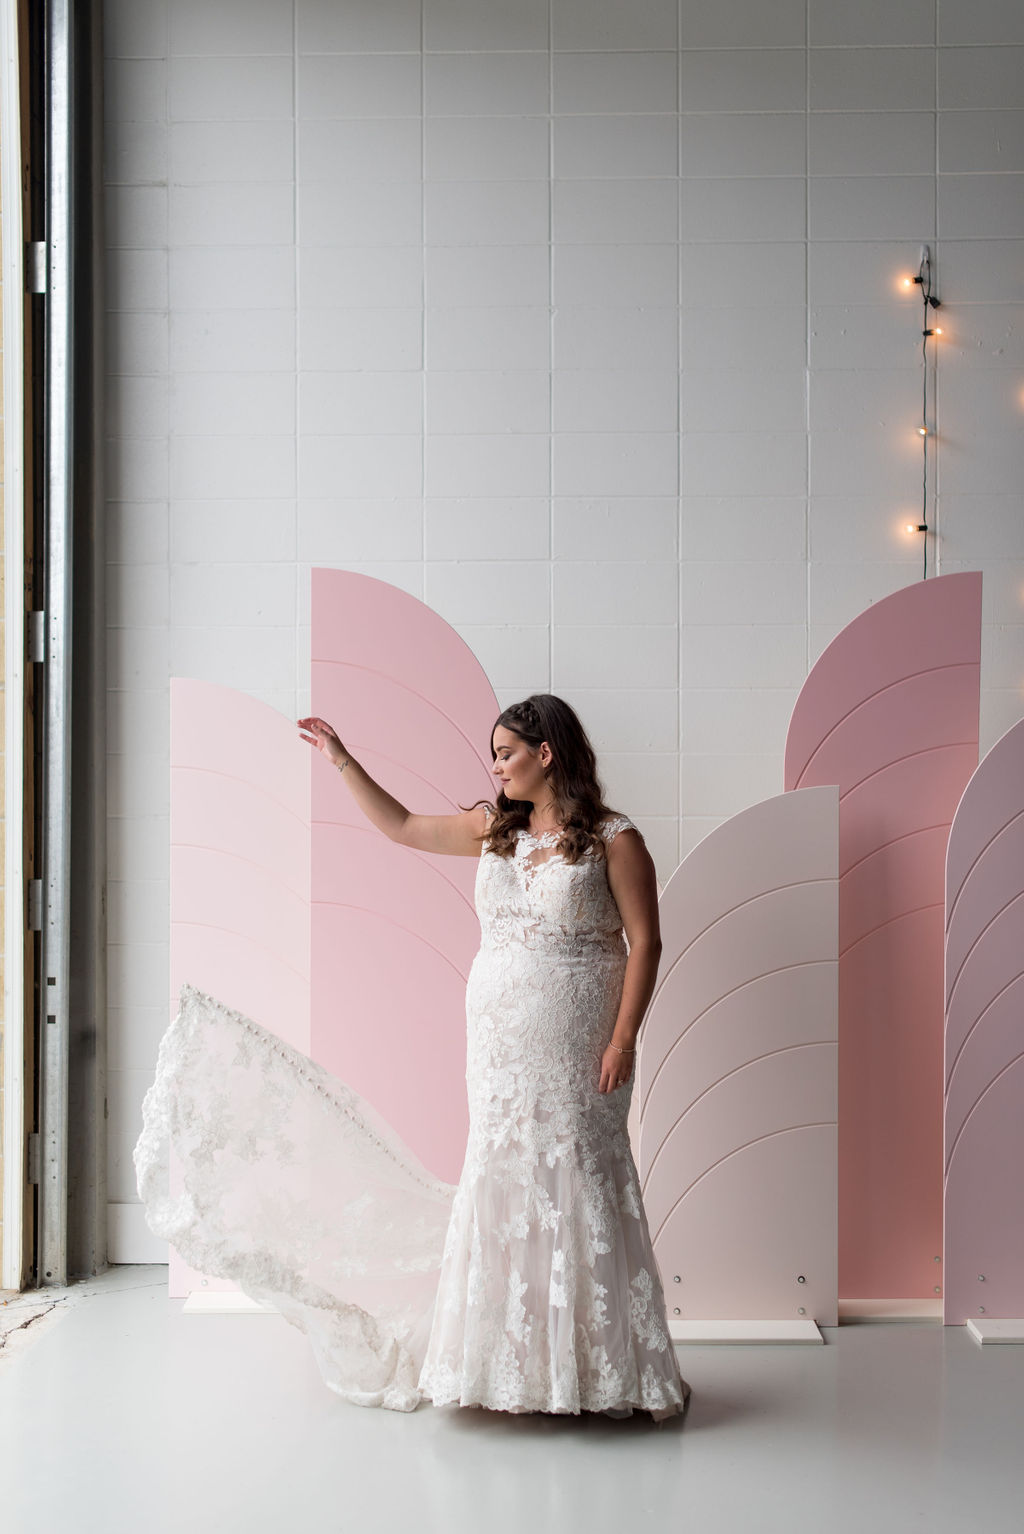 Bridal portrait at the Ellis, romantic, pink wedding